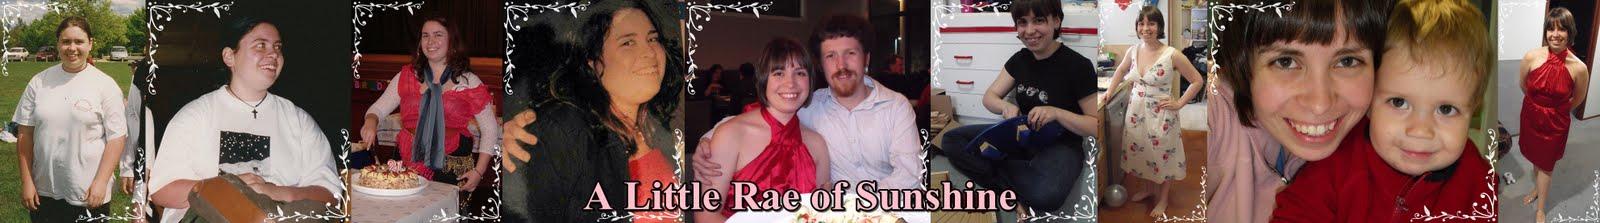 A Little Rae of Sunshine